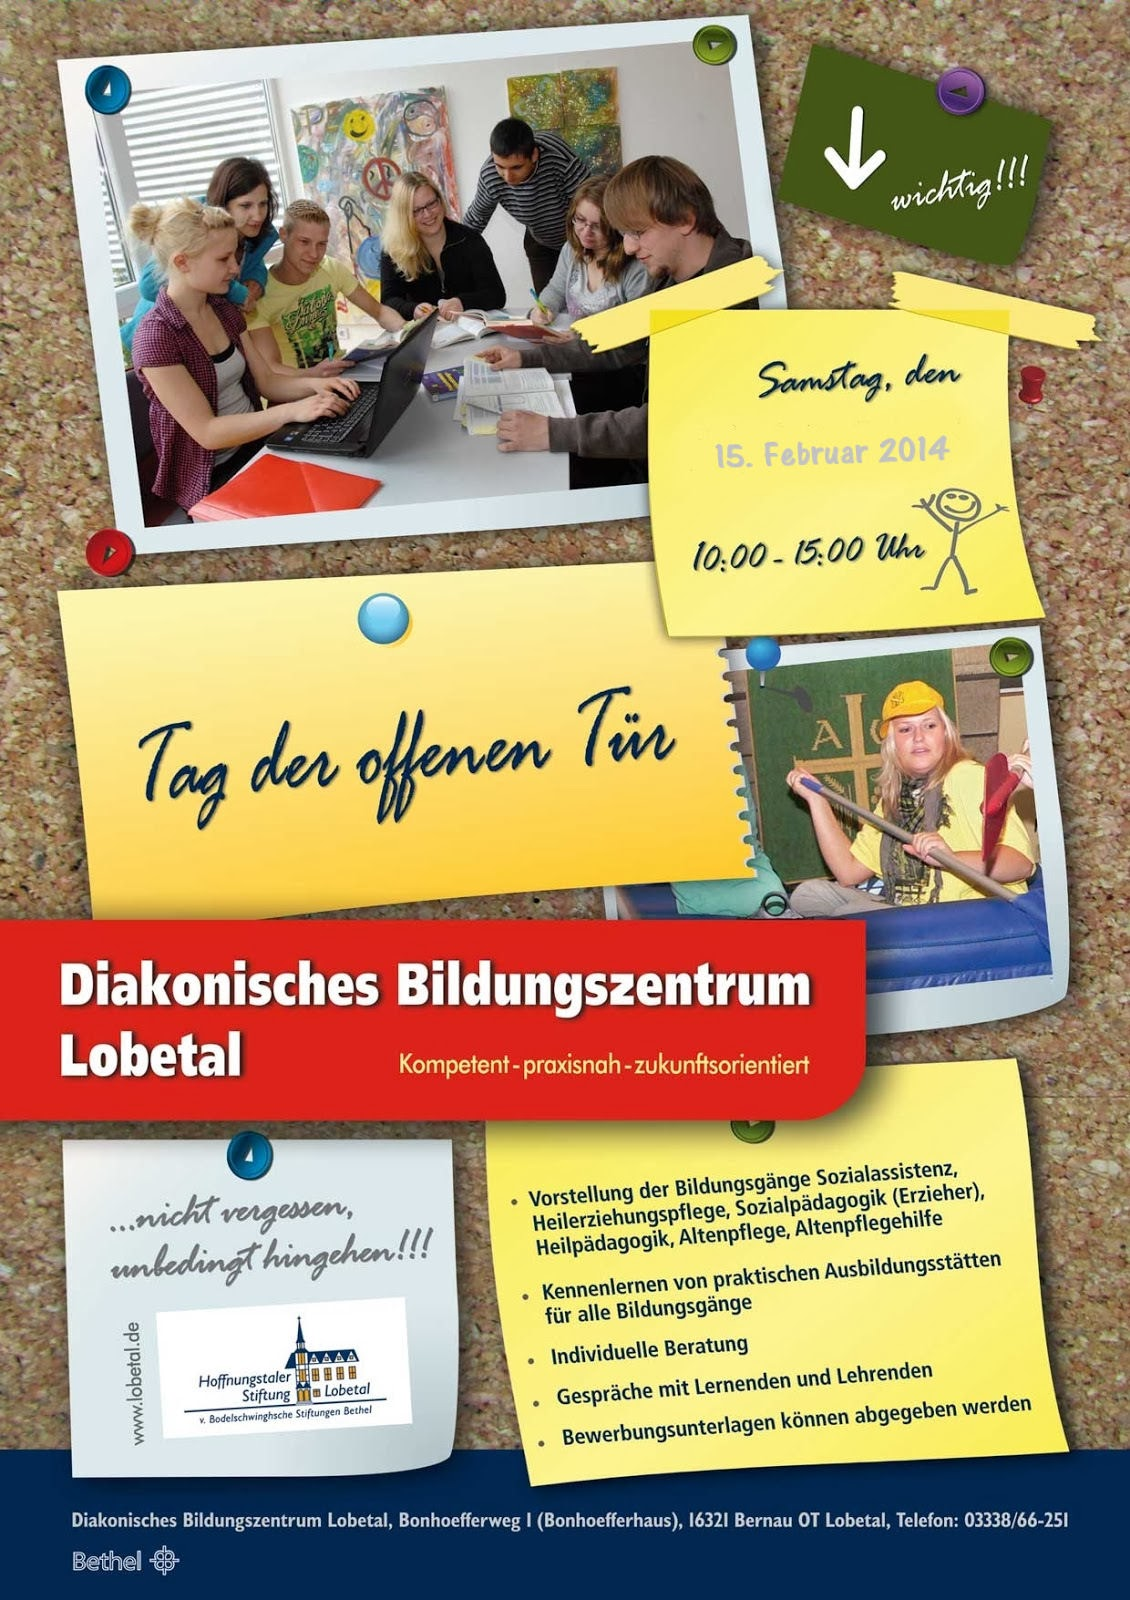 Plakat+Tag+off+T%C3%BCr+(1)+2